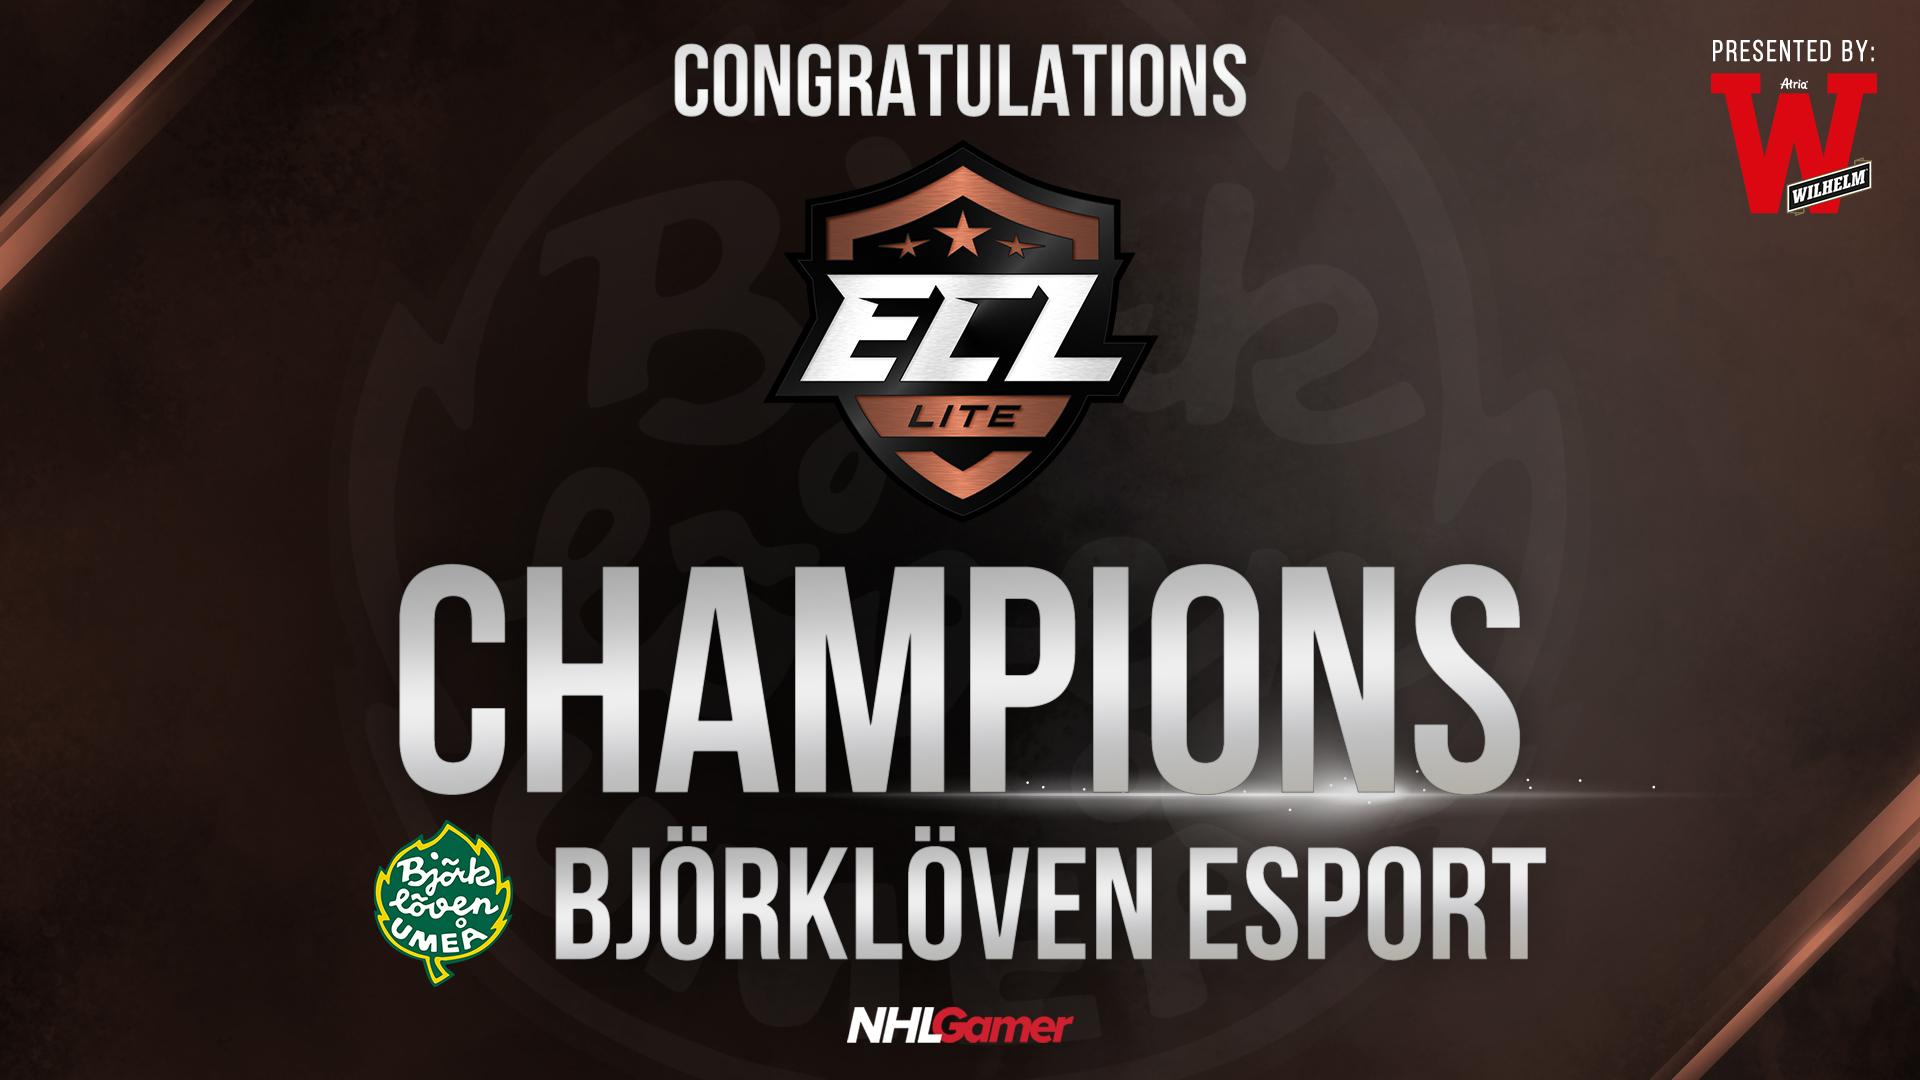 ECL_11_Lite_Champions_Bjorkloven_Esport.